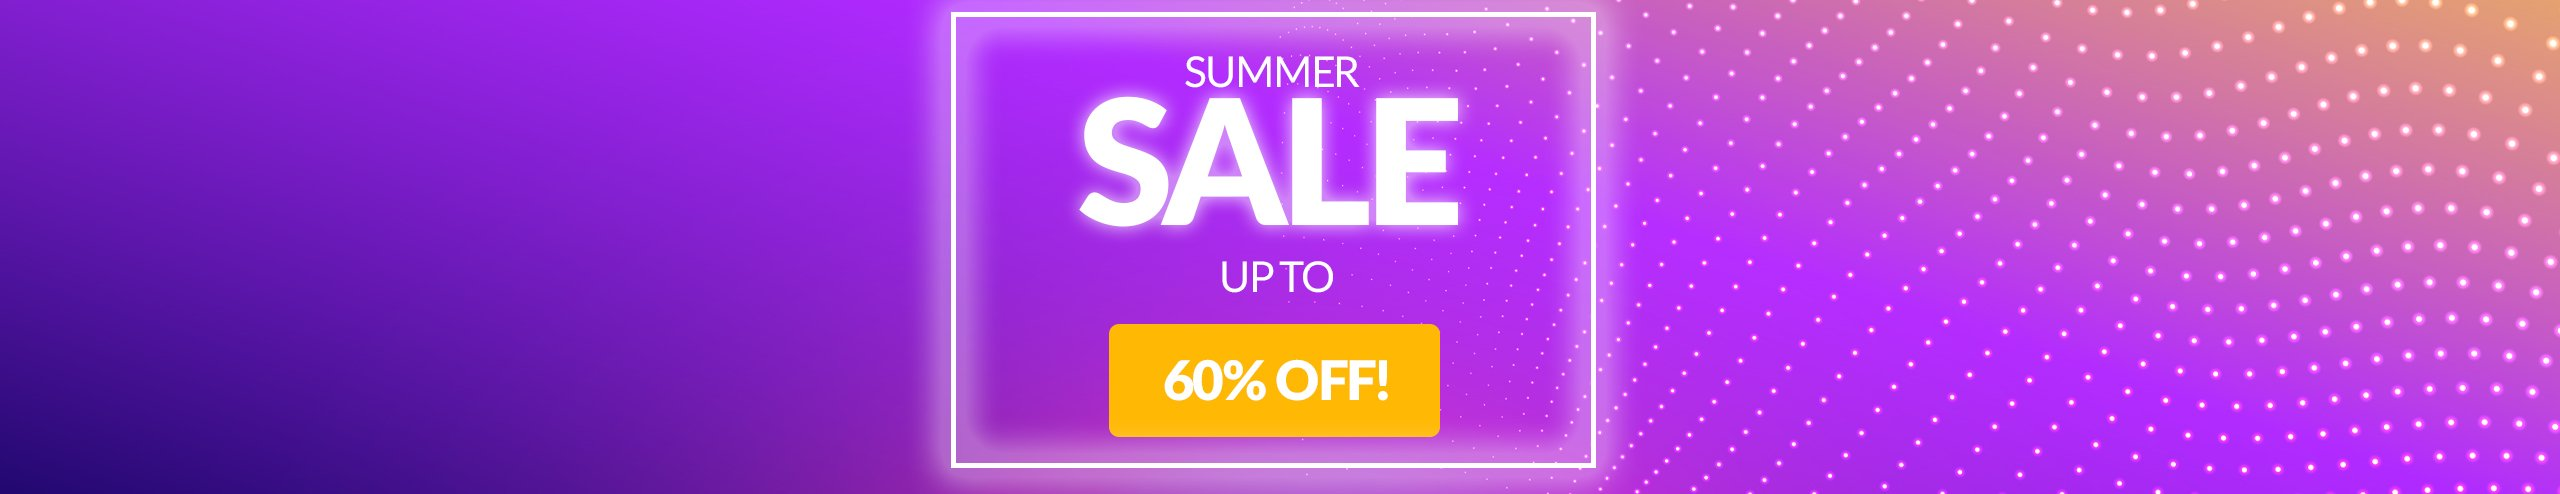 BabyMonitorsDirect Summer Sale